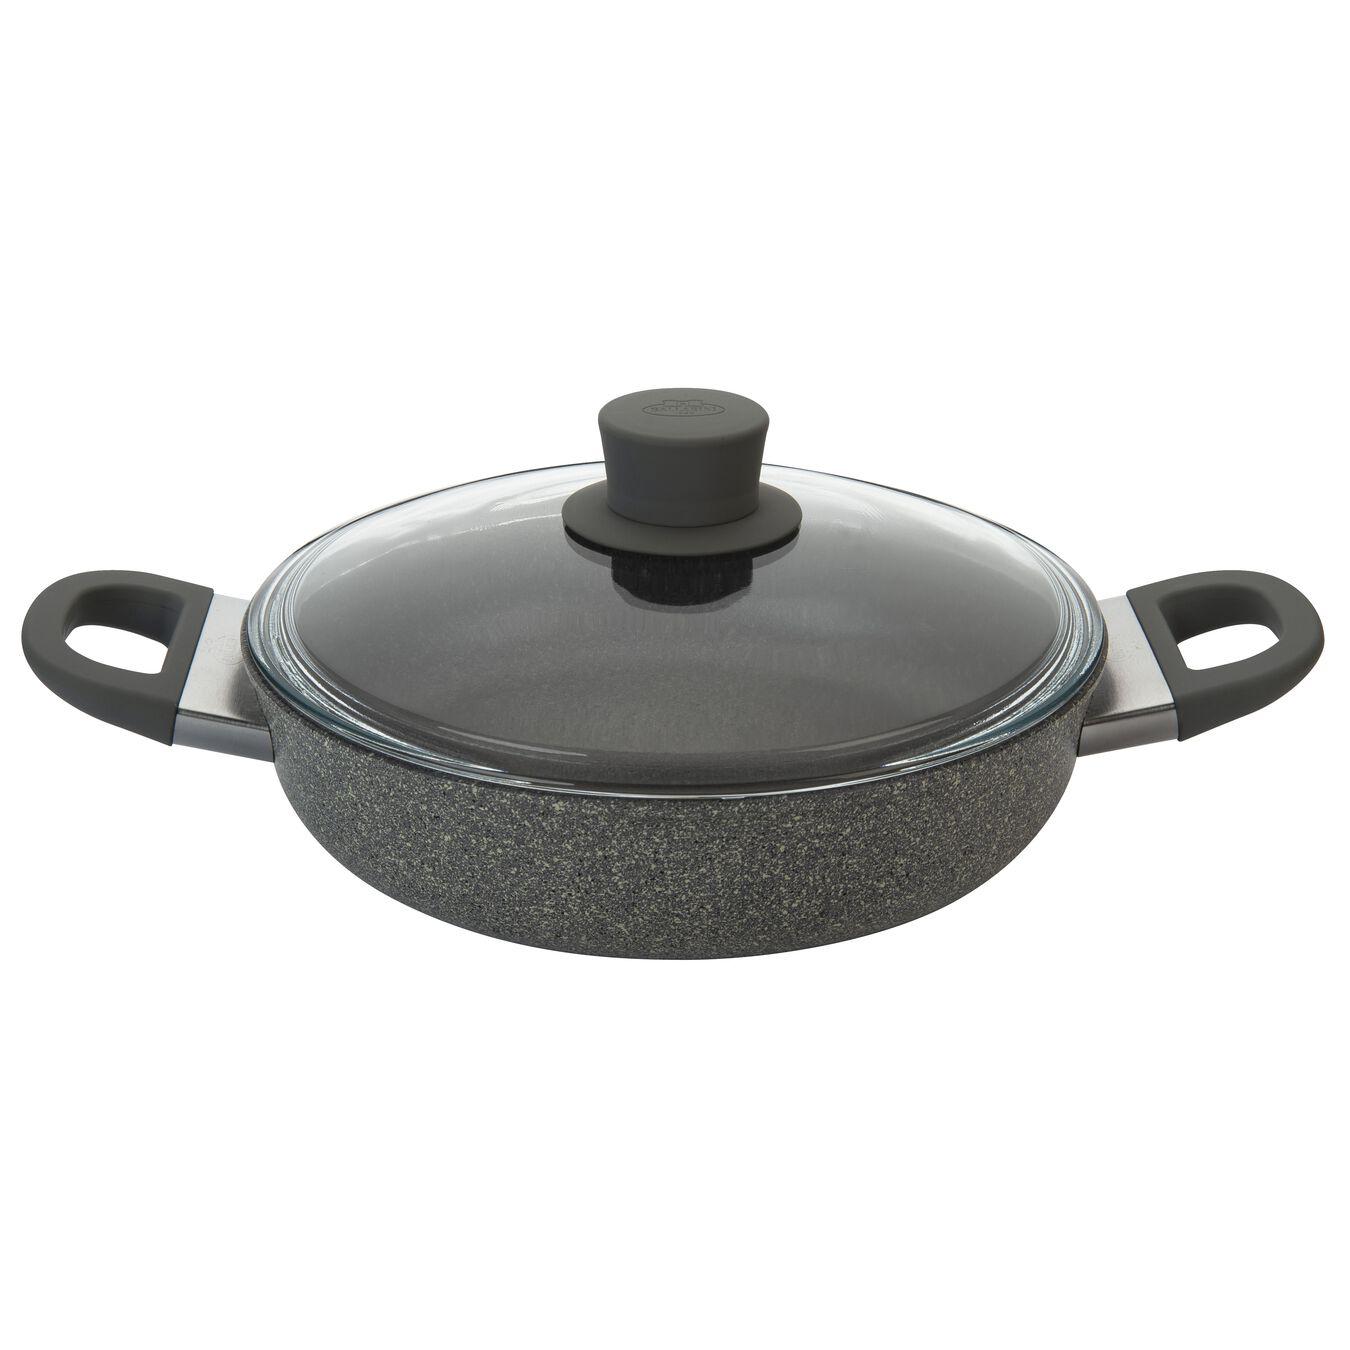 Pilav Tenceresi Cam Kapaklı | Granitium | 28 cm,,large 1